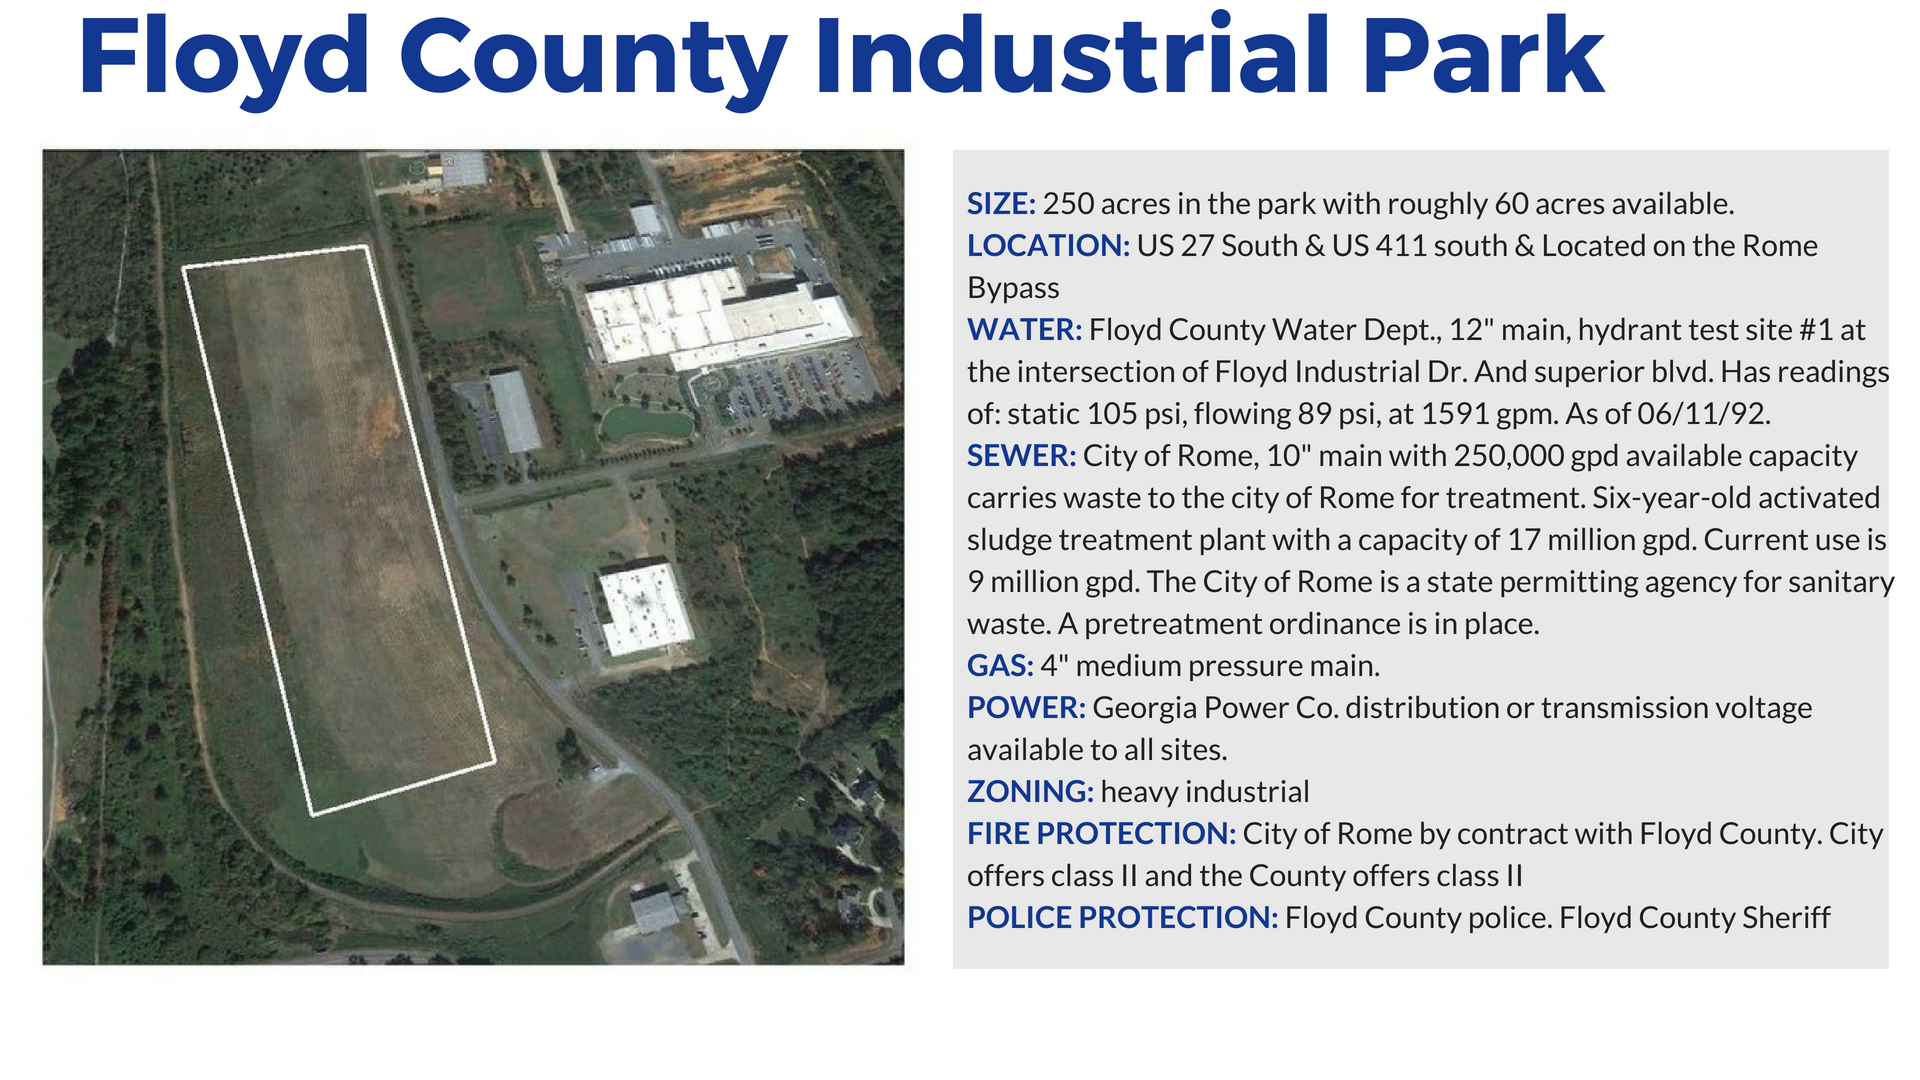 Floyd County Industrial Park in Rome Georgia and Floyd County Georgia